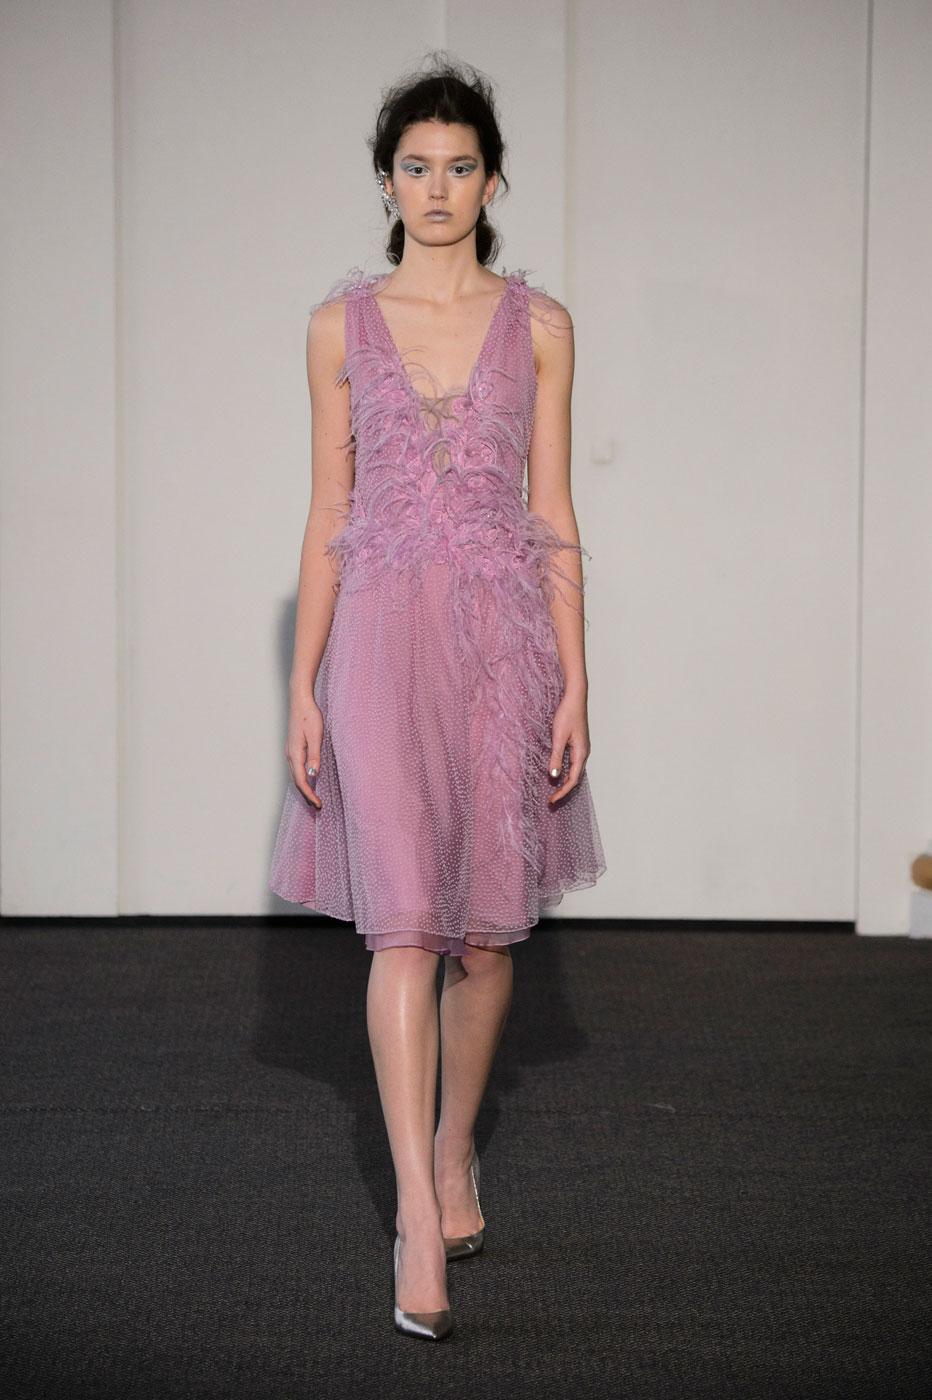 Busardi-fashion-runway-show-haute-couture-paris-spring-2015-the-impression-34